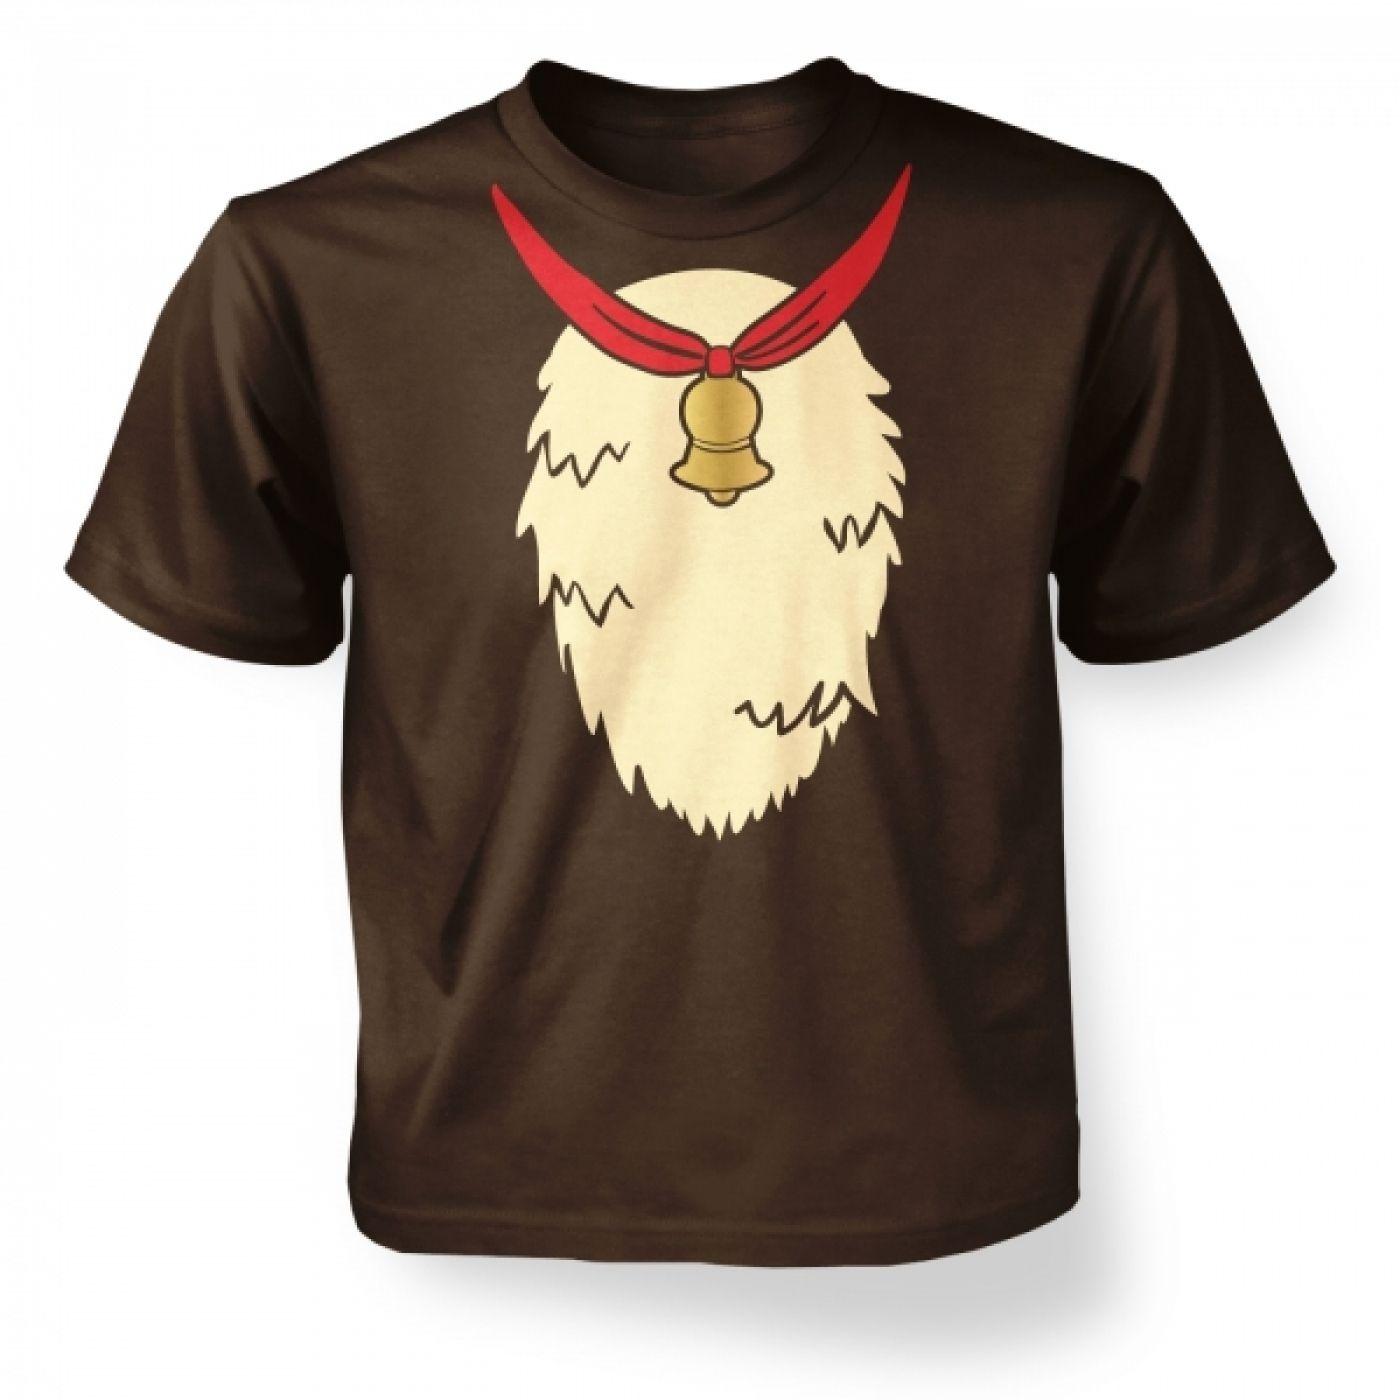 Reindeer Costume kid's t-shirt